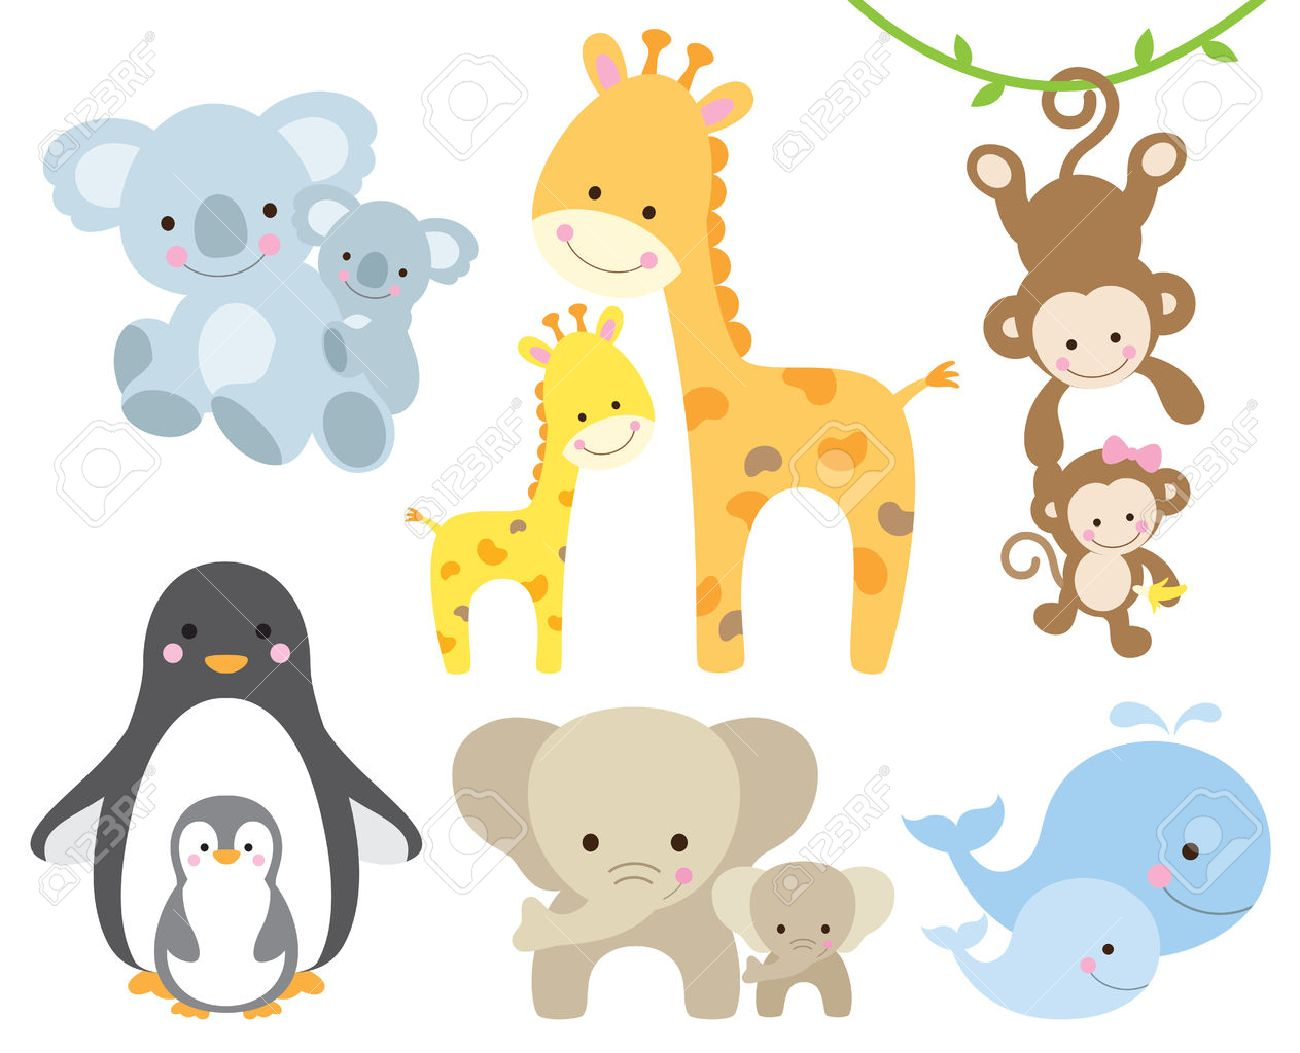 Vector illustration of animal and baby including koalas, penguins, giraffes, monkeys, elephants, whales. Stock Vector - 46792877